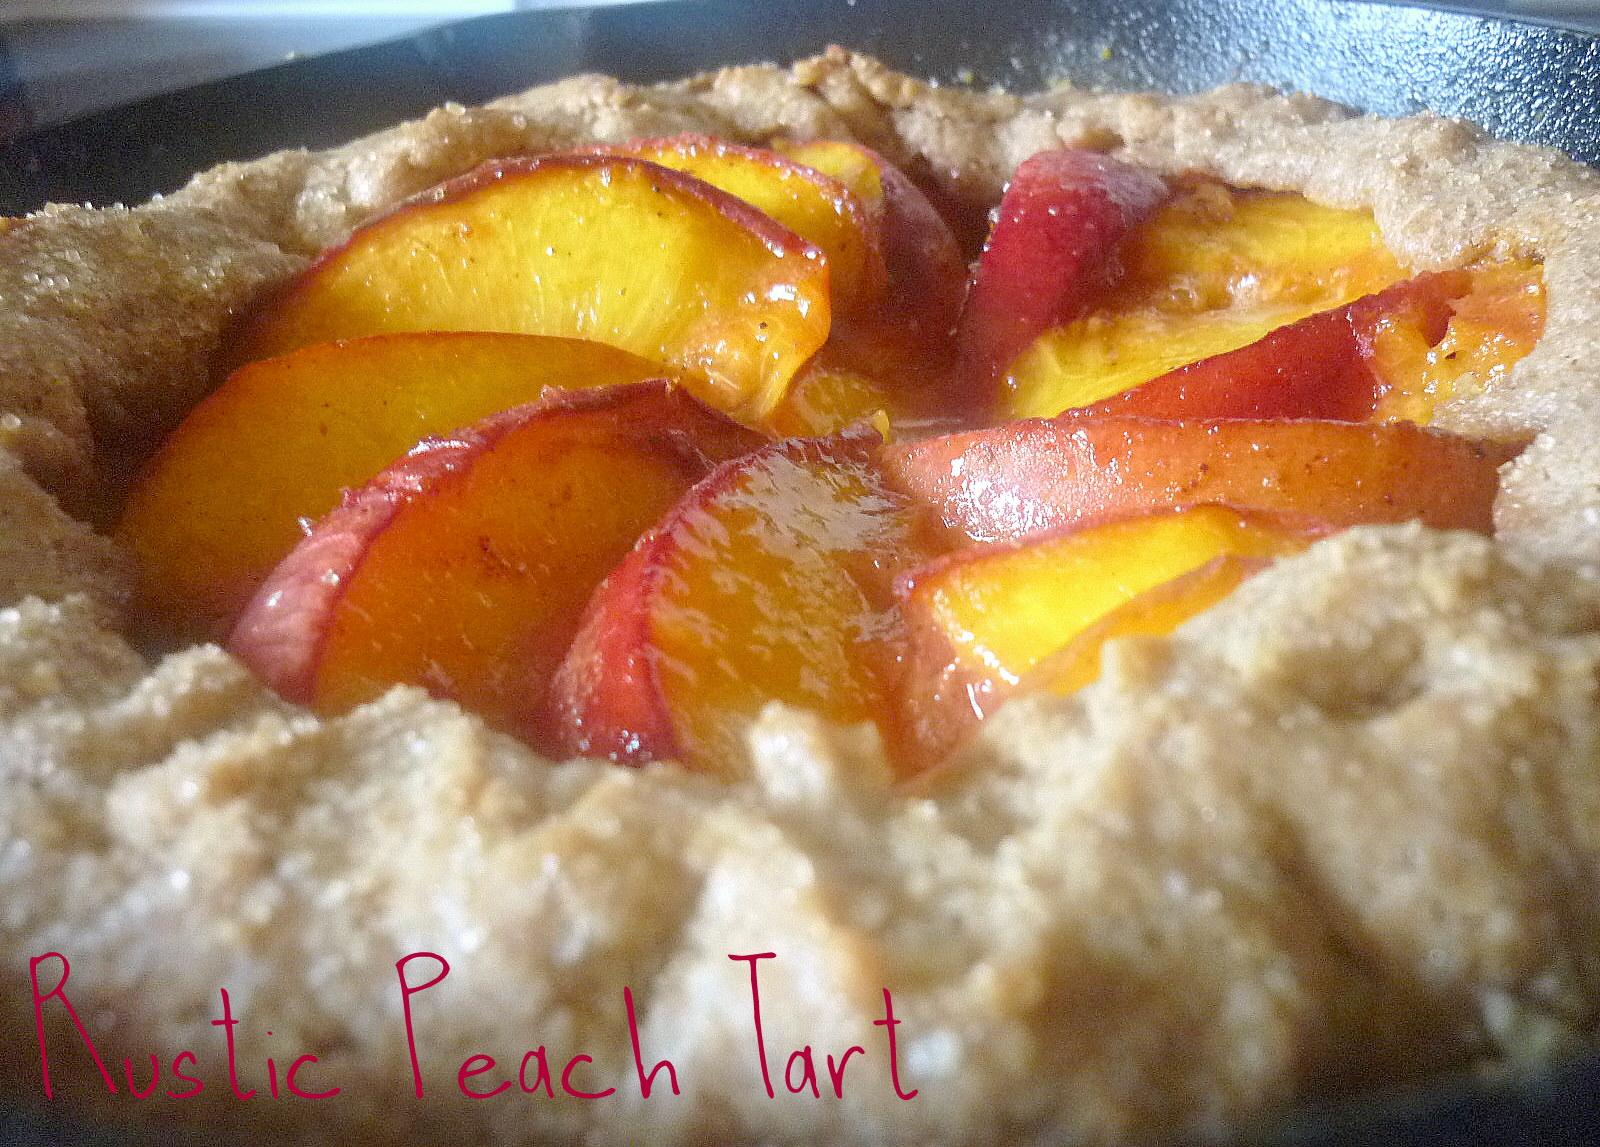 Rustic Peach Tart - Sprinkled with Flour